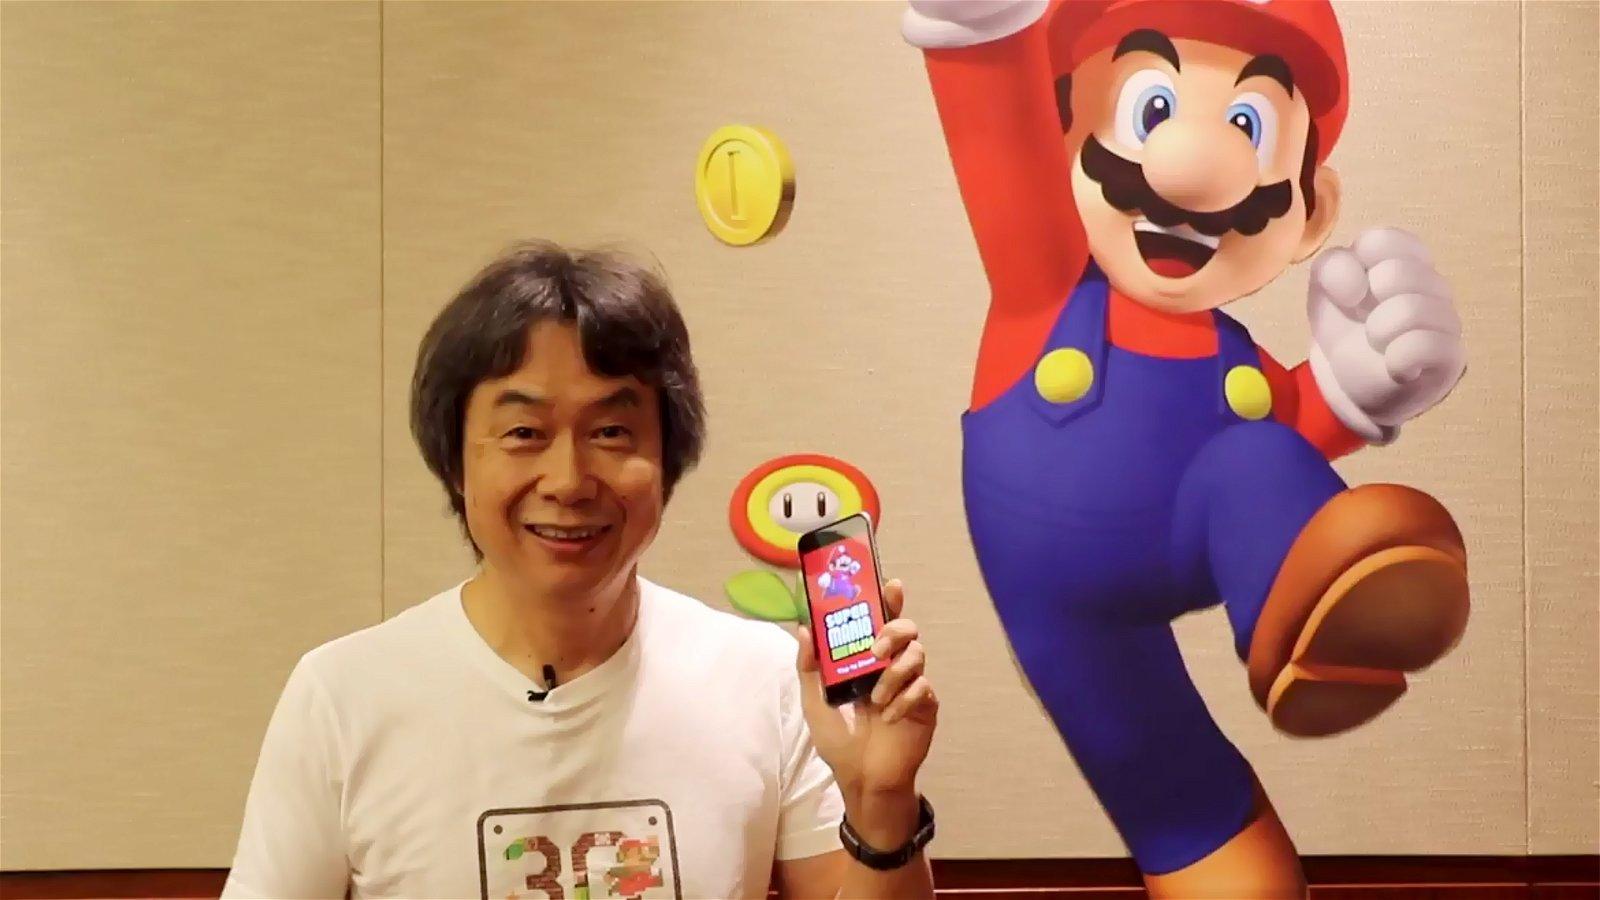 Super Mario Run Review Round-Up